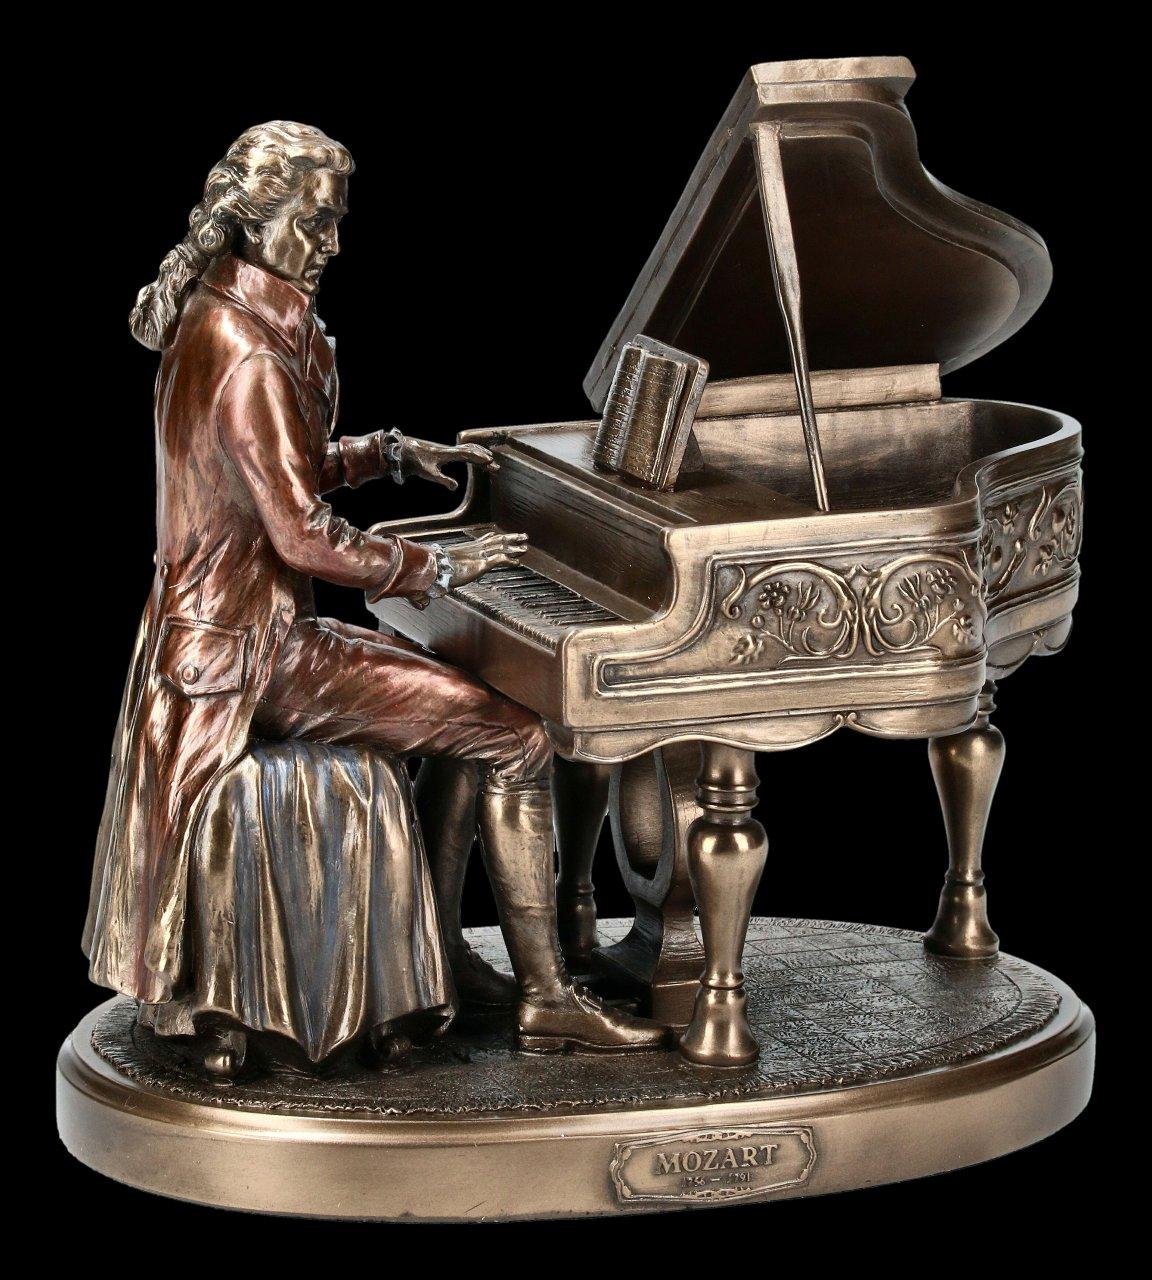 Mozart am Klavier